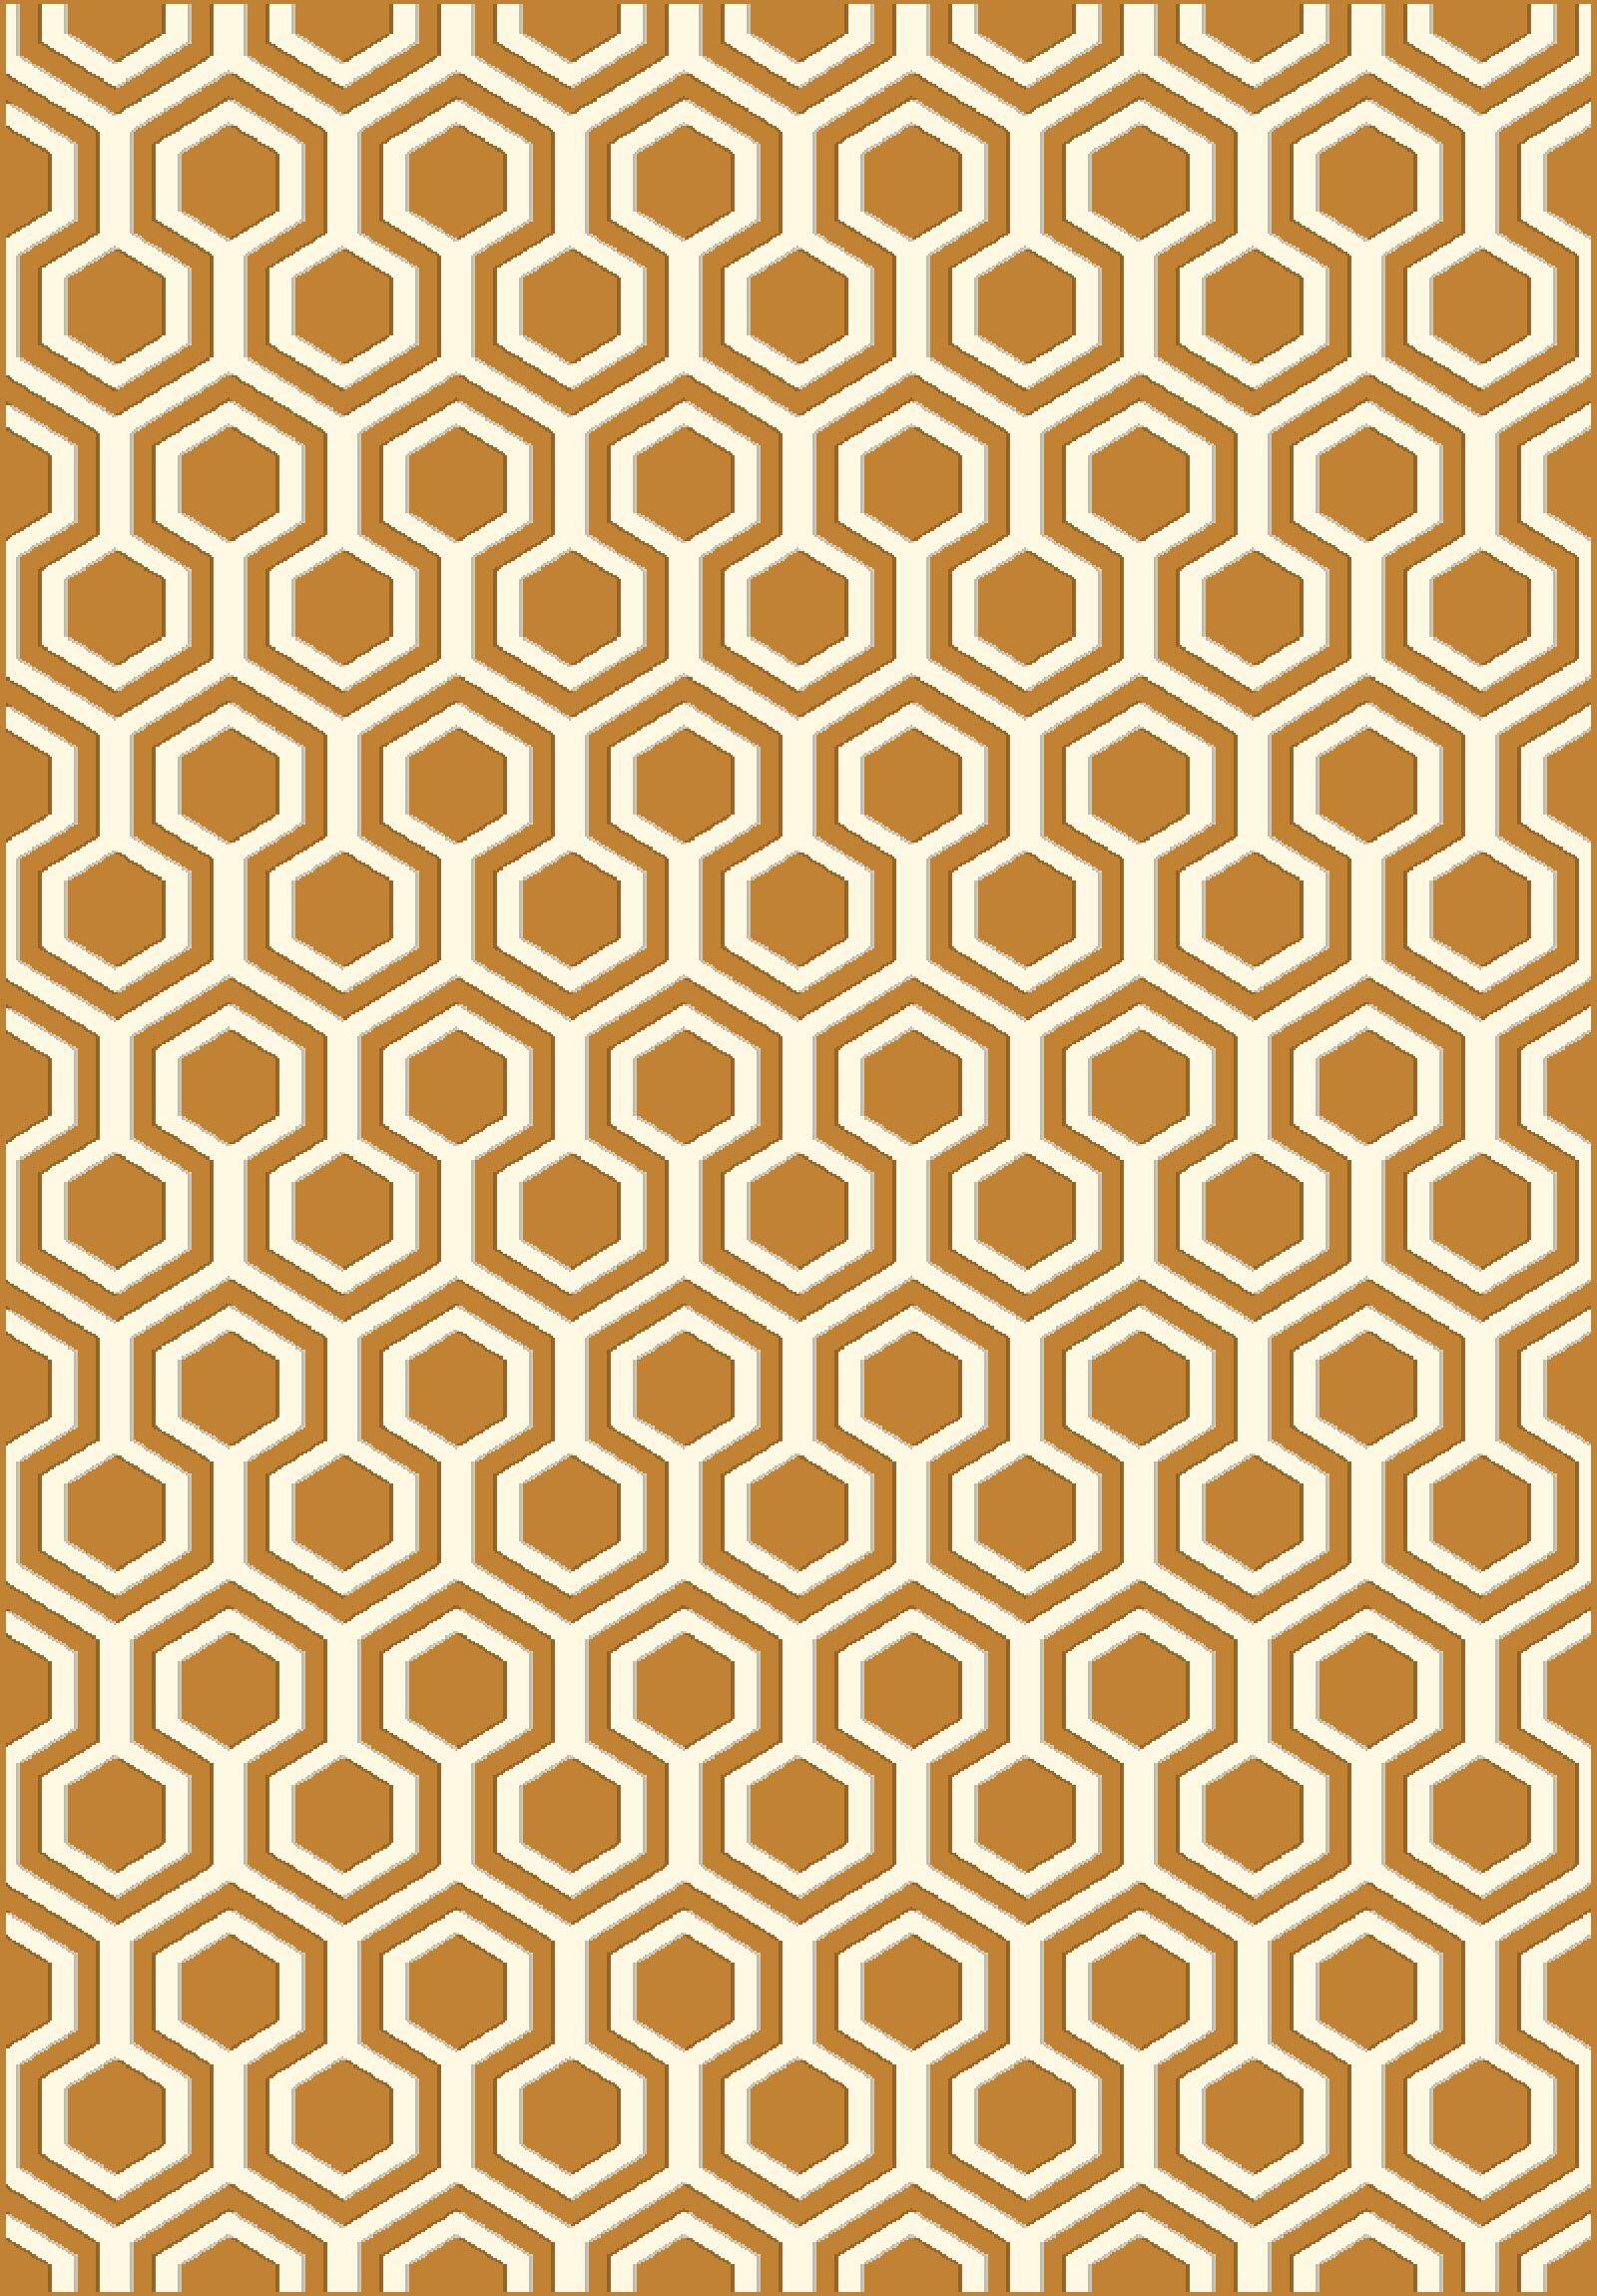 Trend Orange Geometric Area Rug Rug Size: Rectangle 6'7